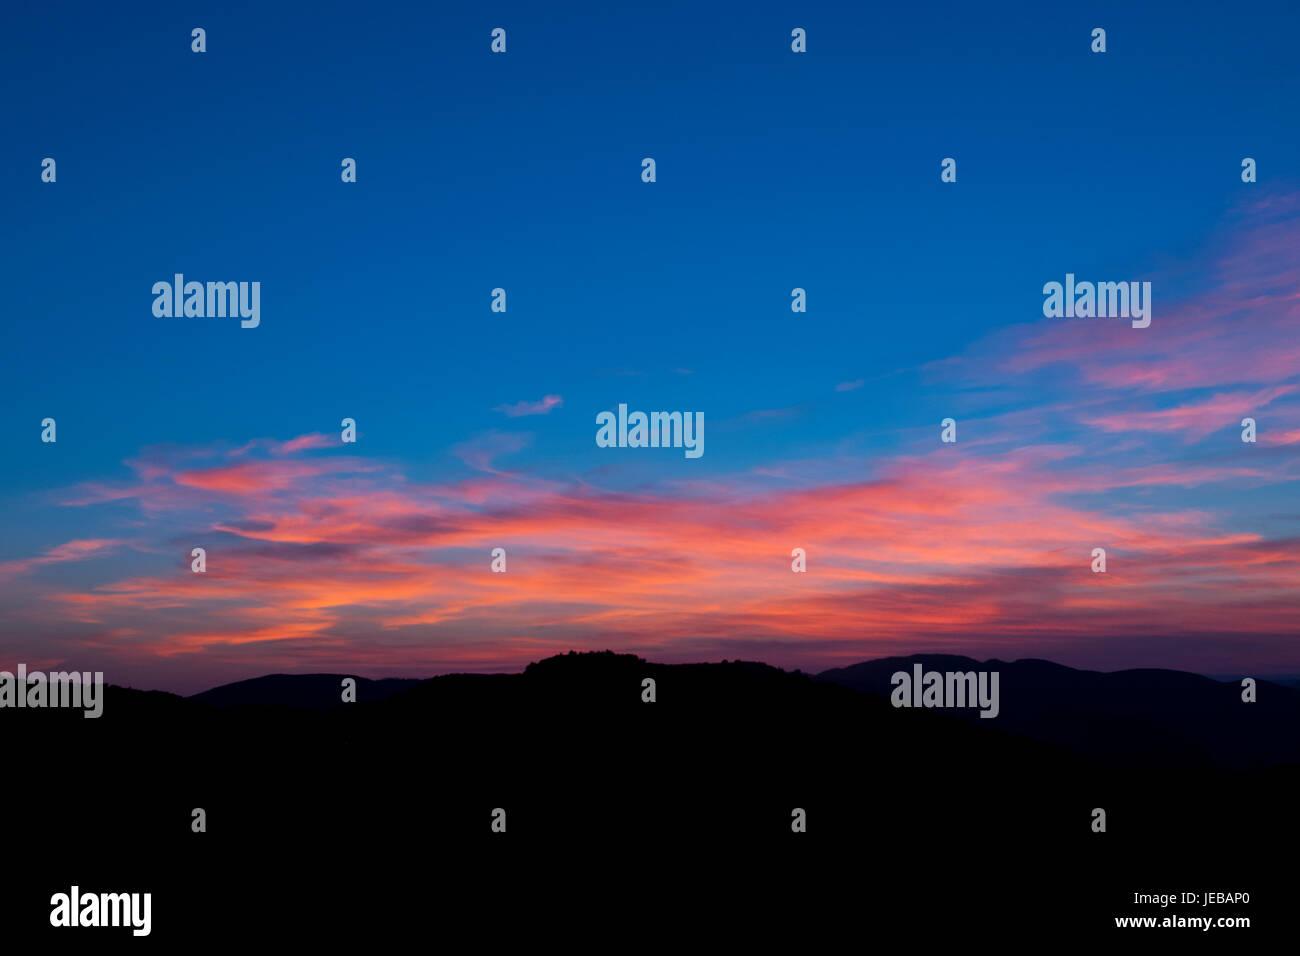 Sunset. - Stock Image